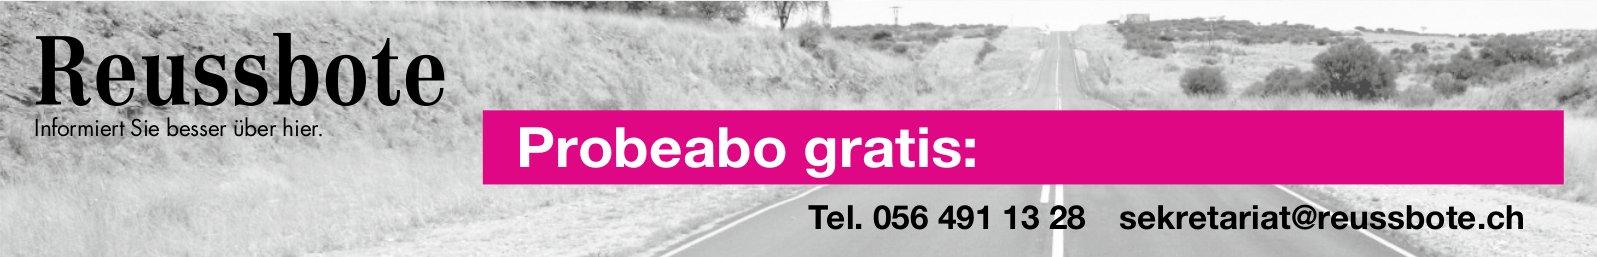 Reussbote - Probeabo gratis